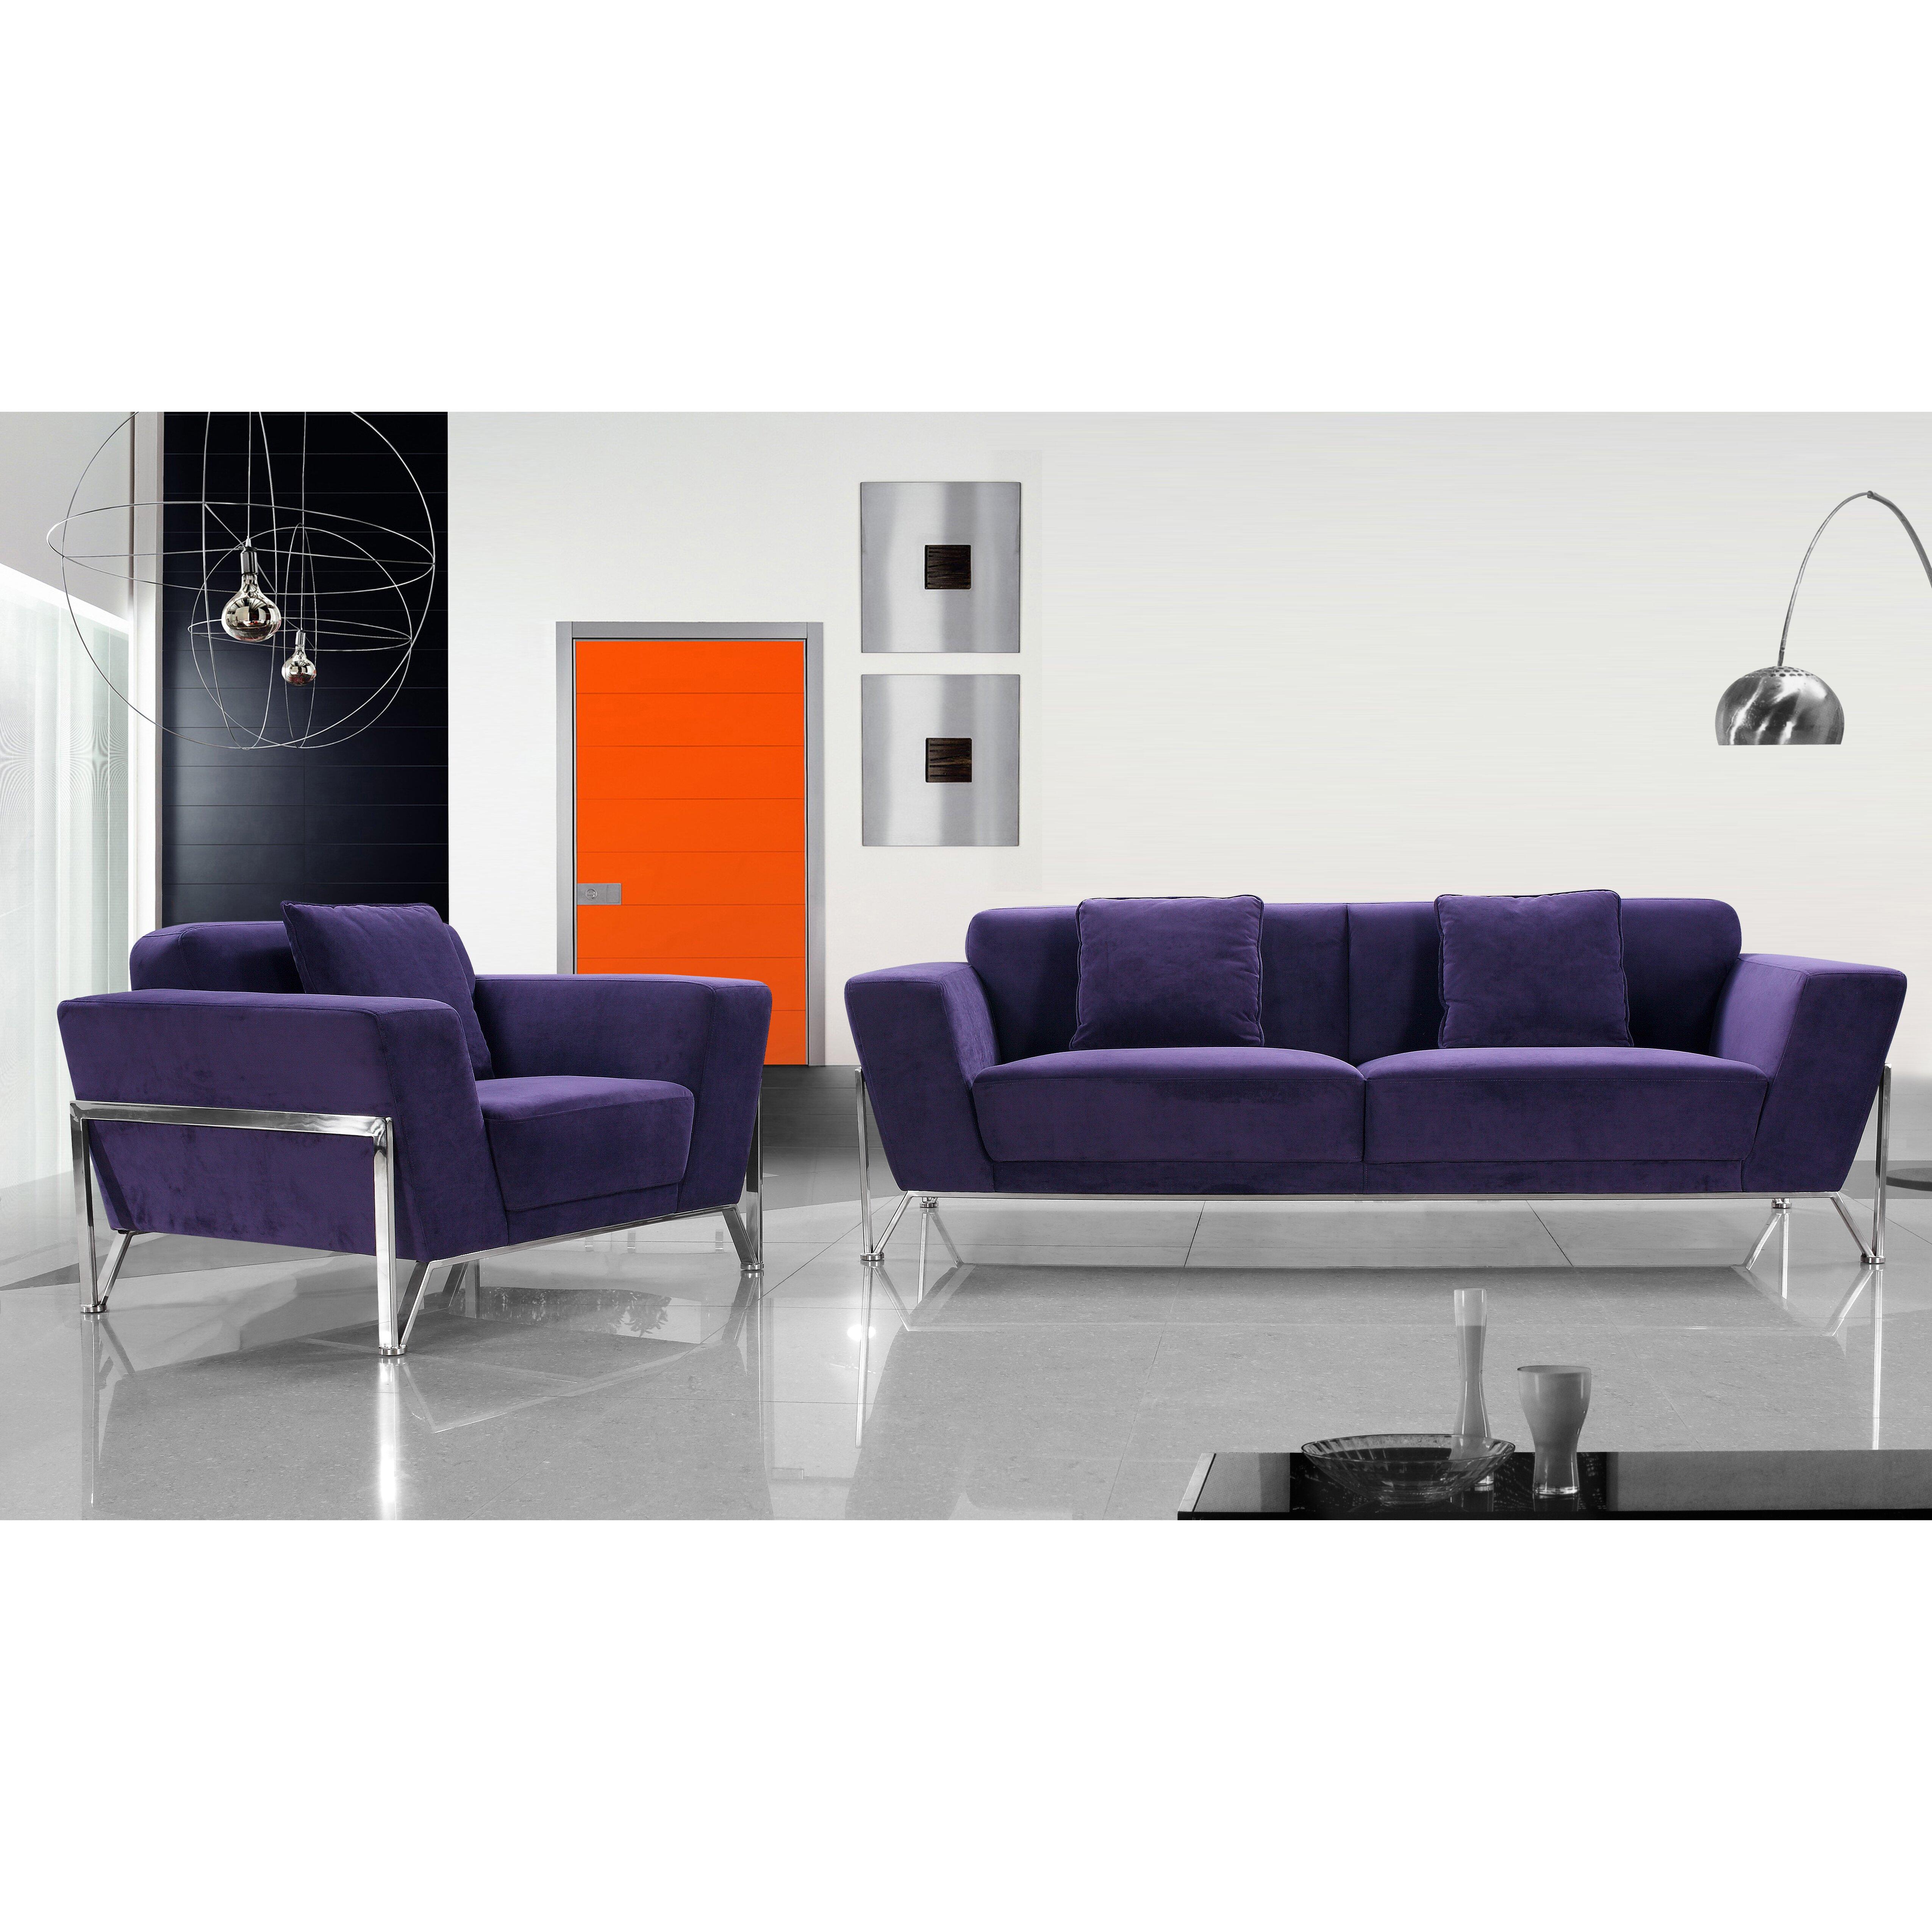 Vig furniture divani casa loveseat and chair wayfair for Divani recliner